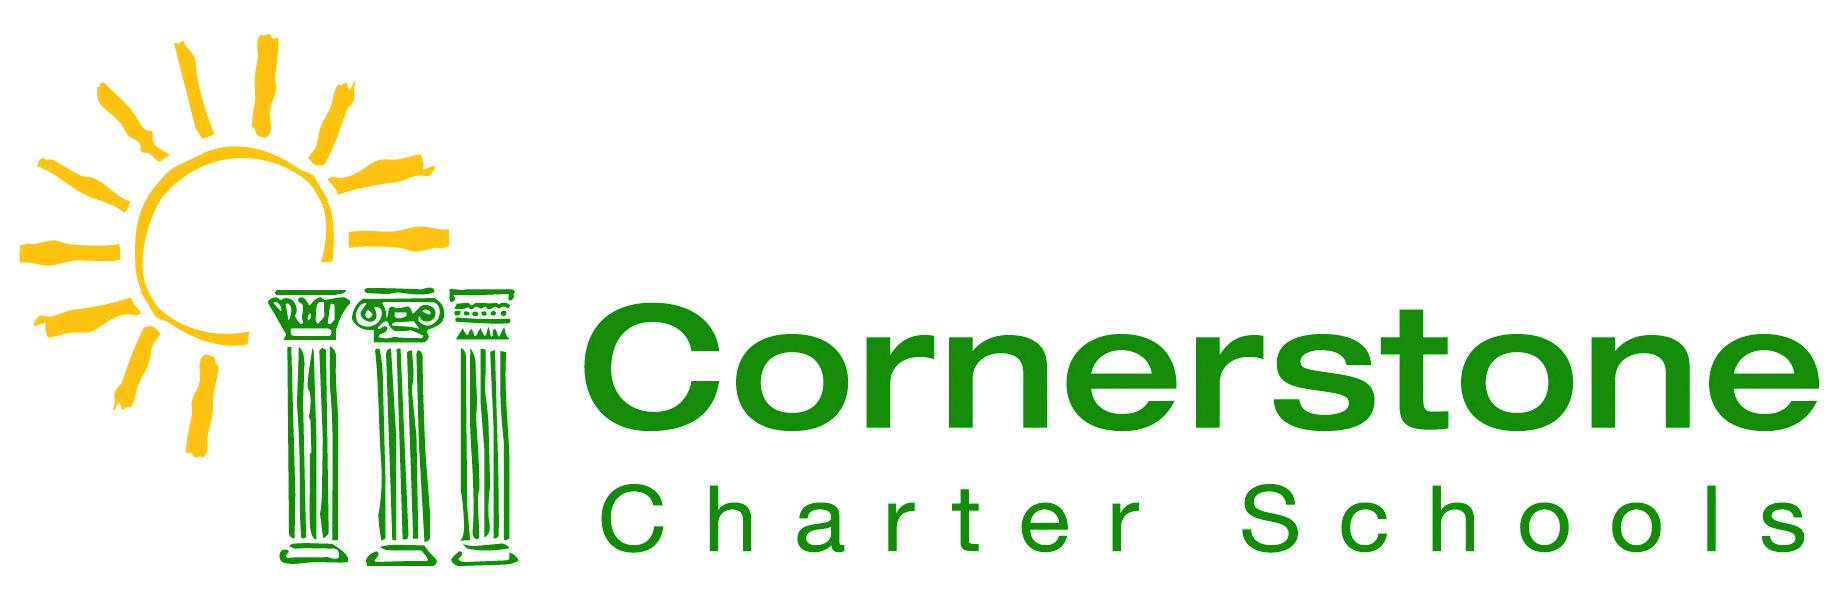 Cornerstone Charter Schools logo